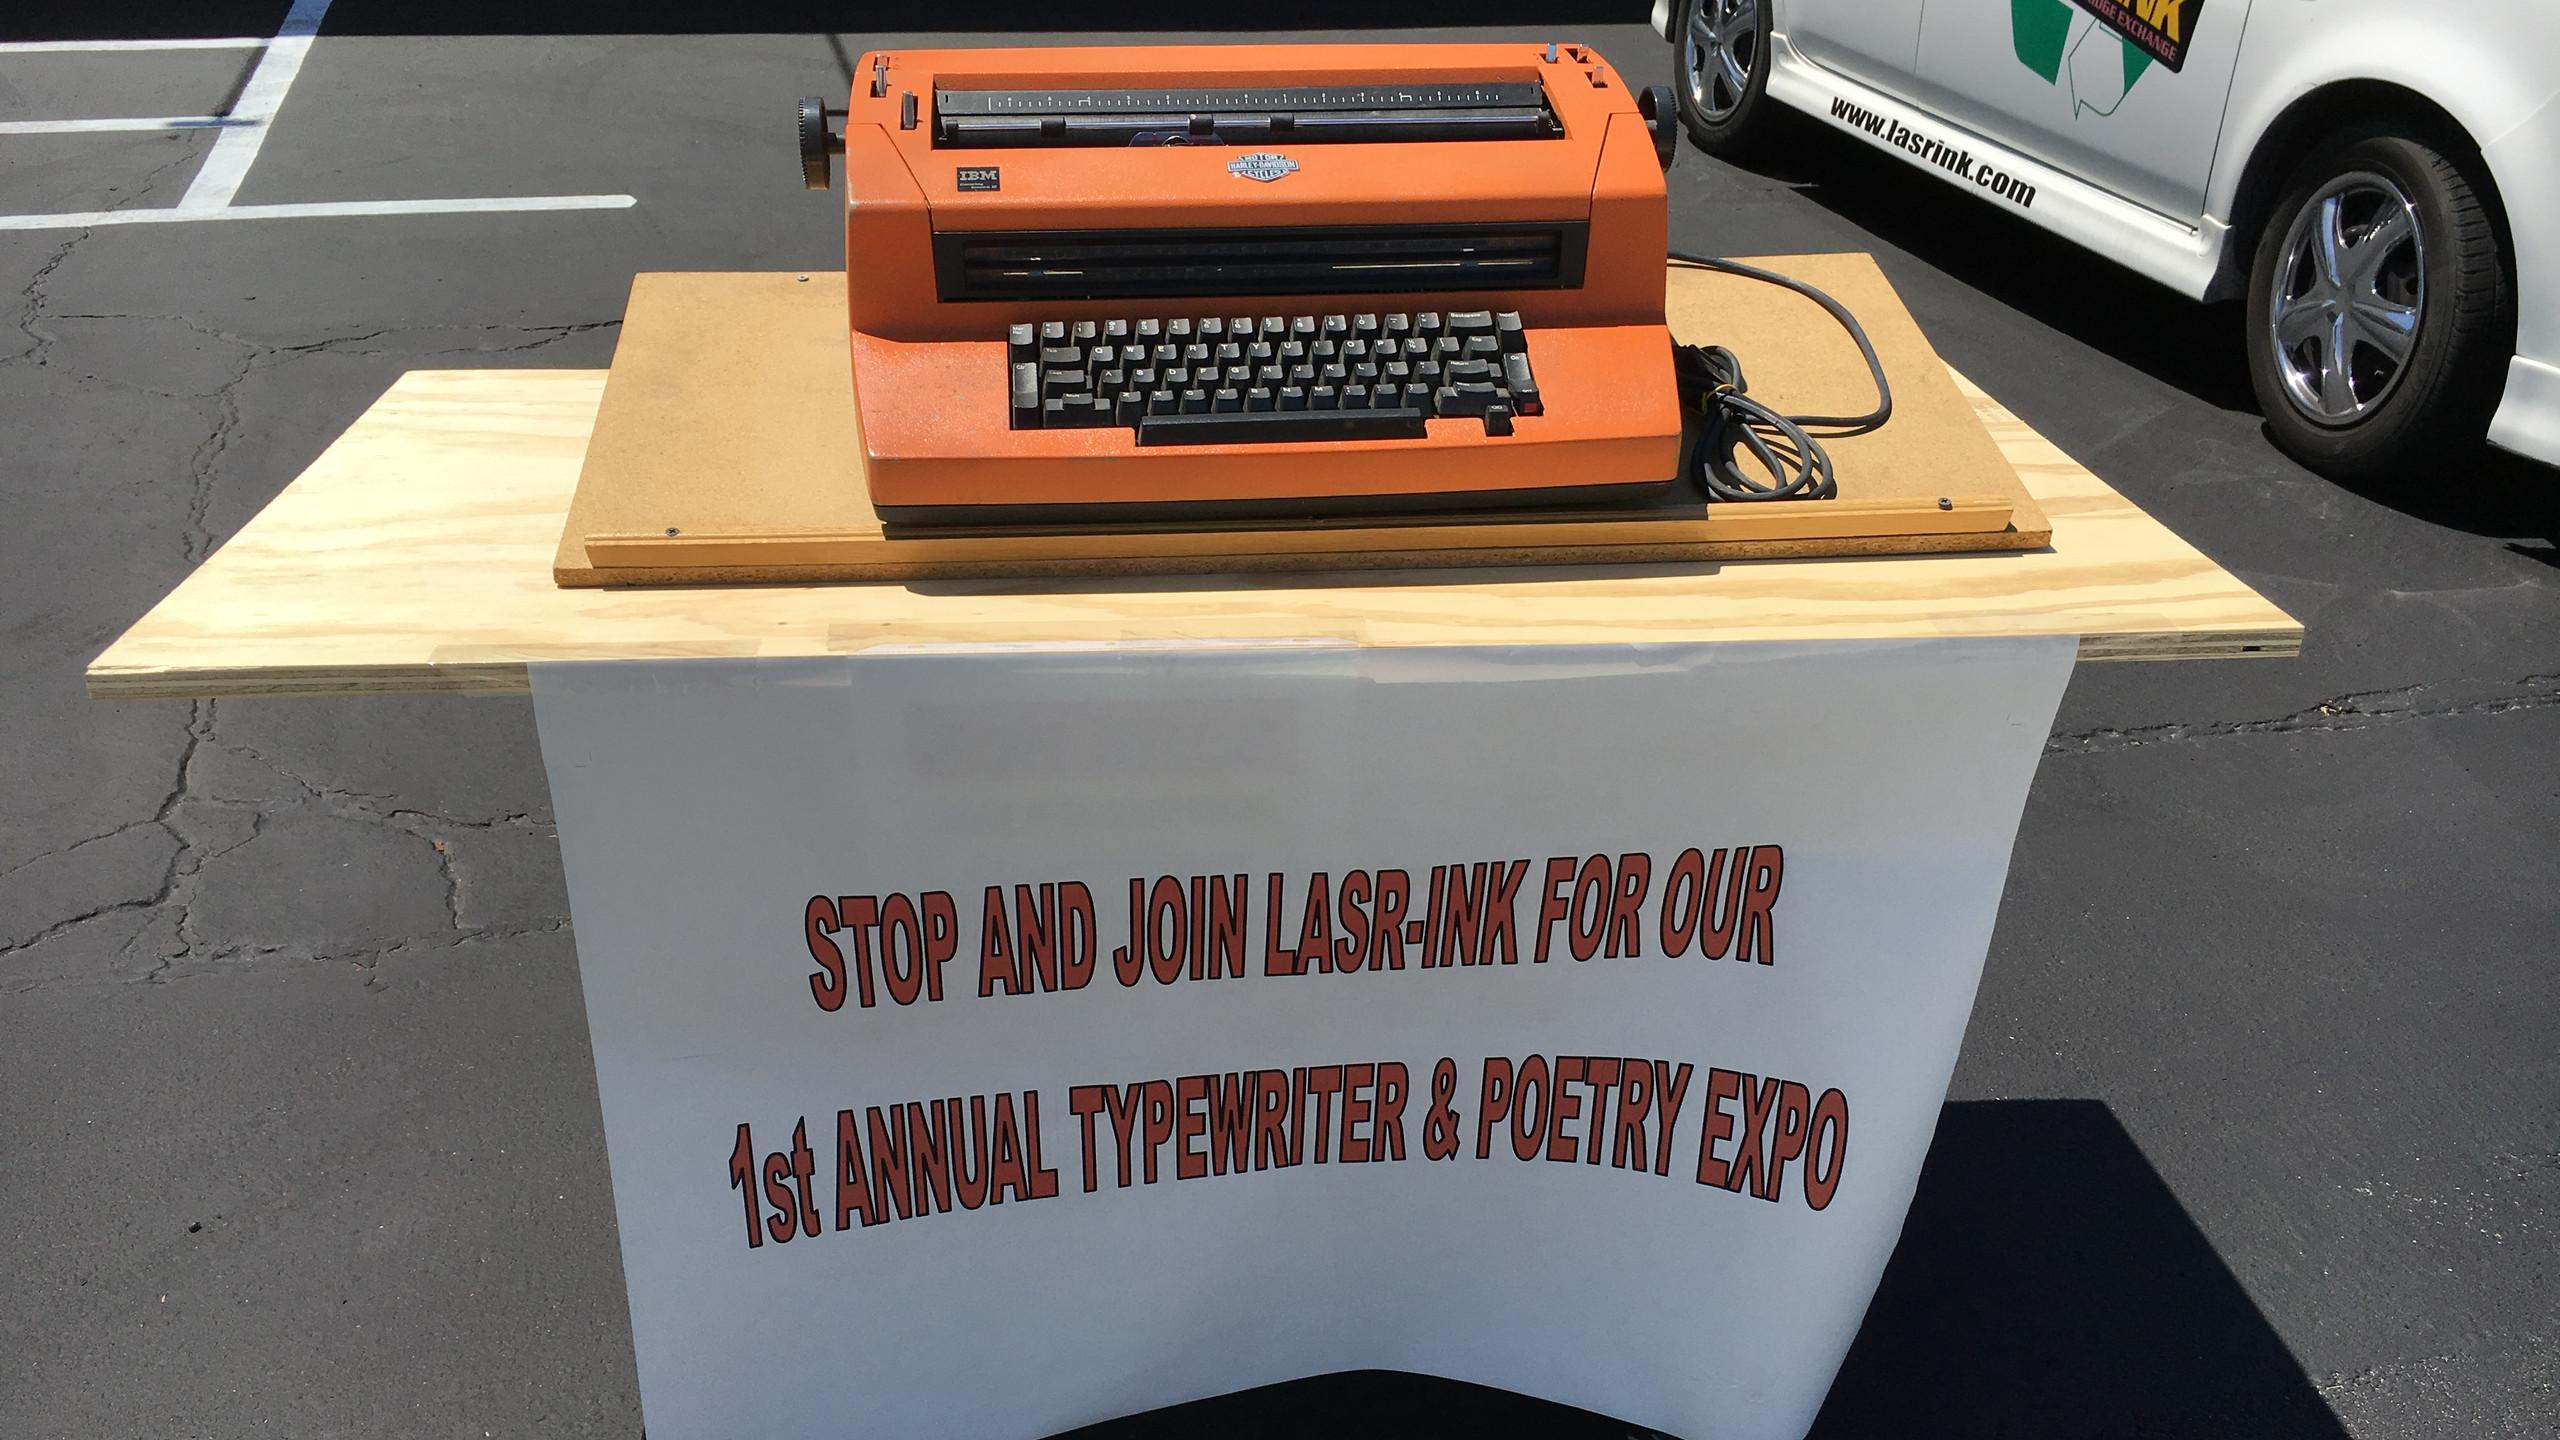 Typewriter & Poetry Expo